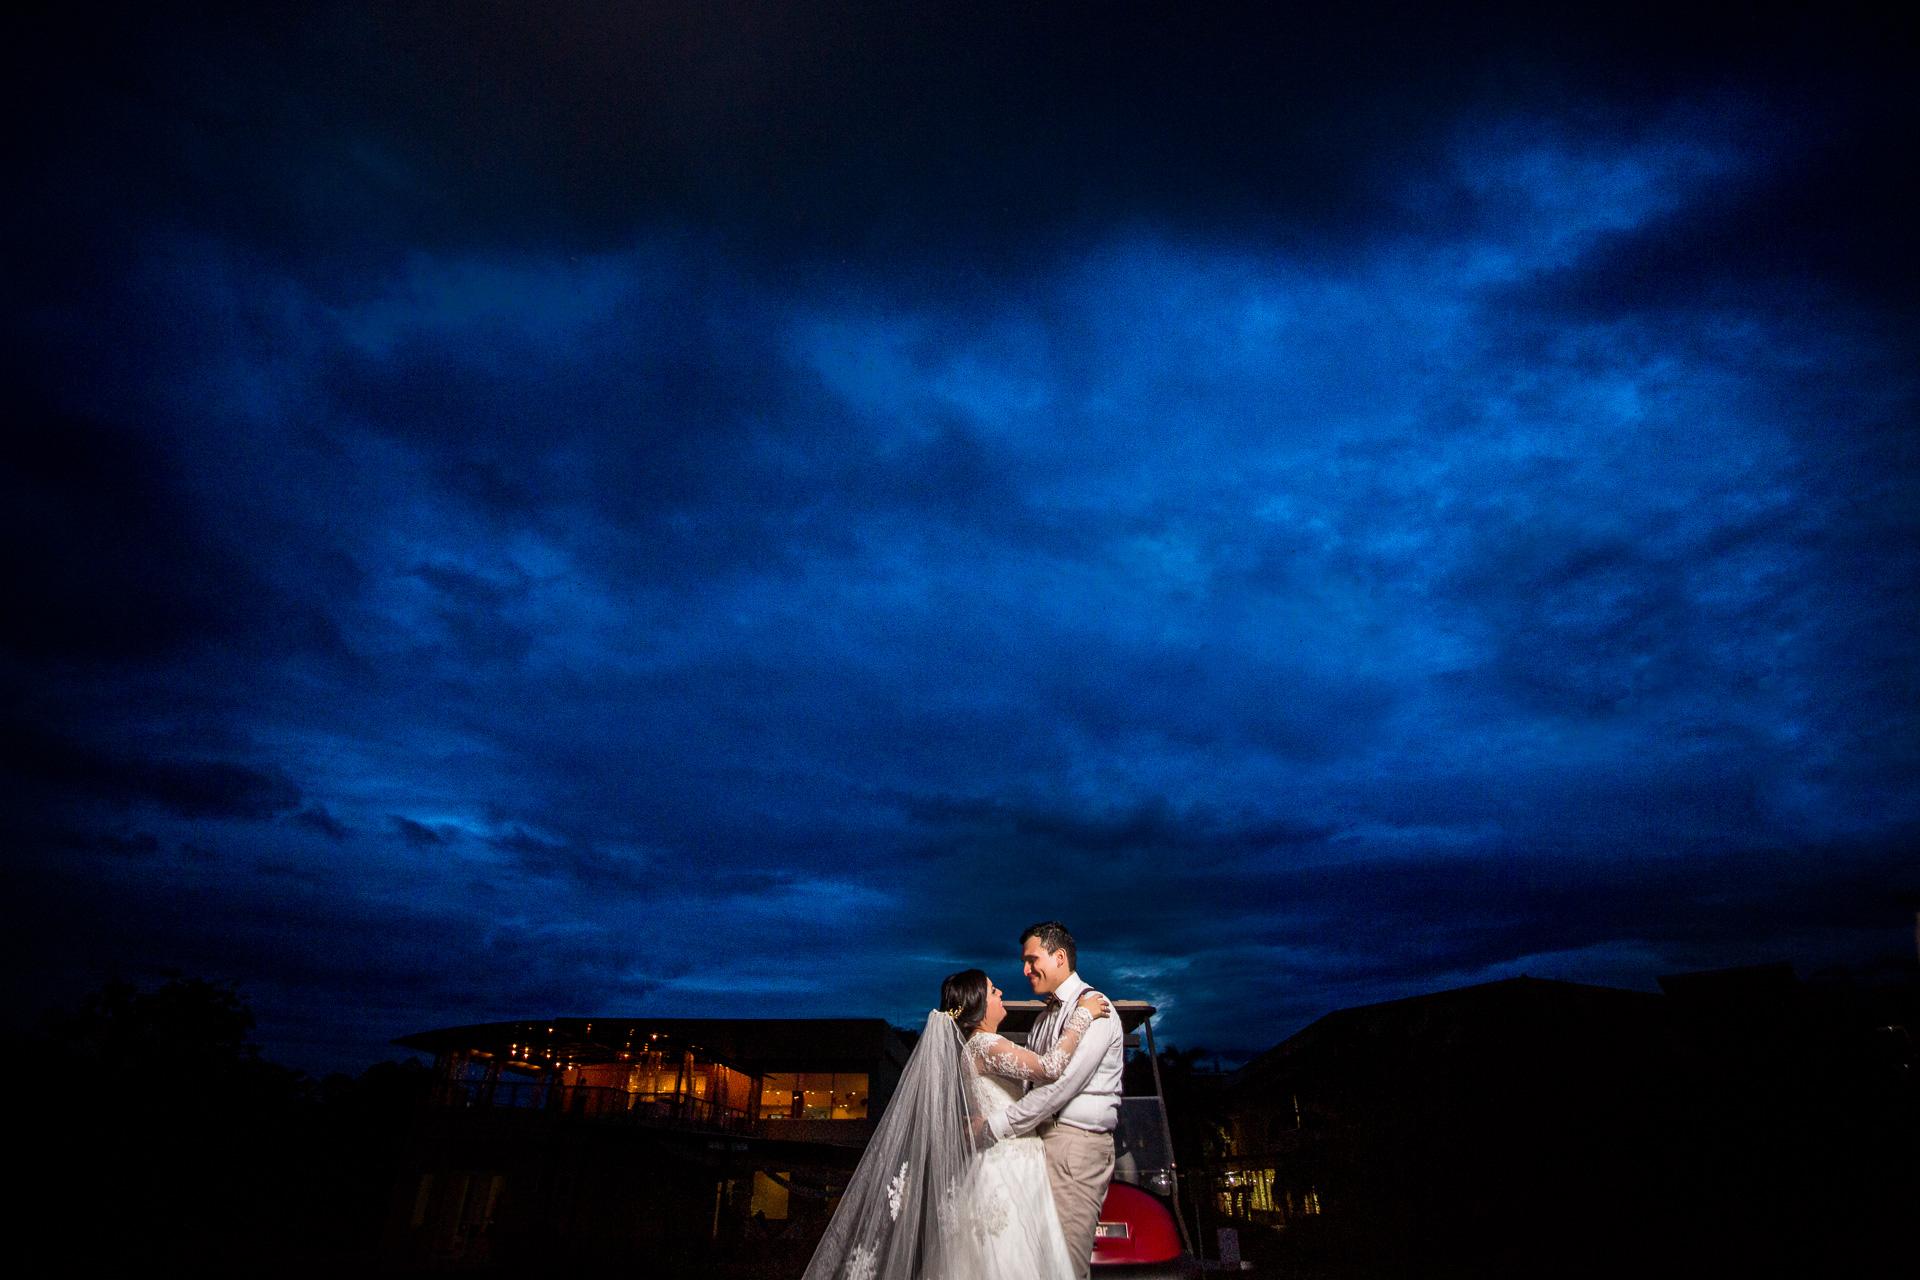 Fotógrafos-de-bodas-en-Colombia-Sthephanie-y-David-46 STEPHANIE + DAVID